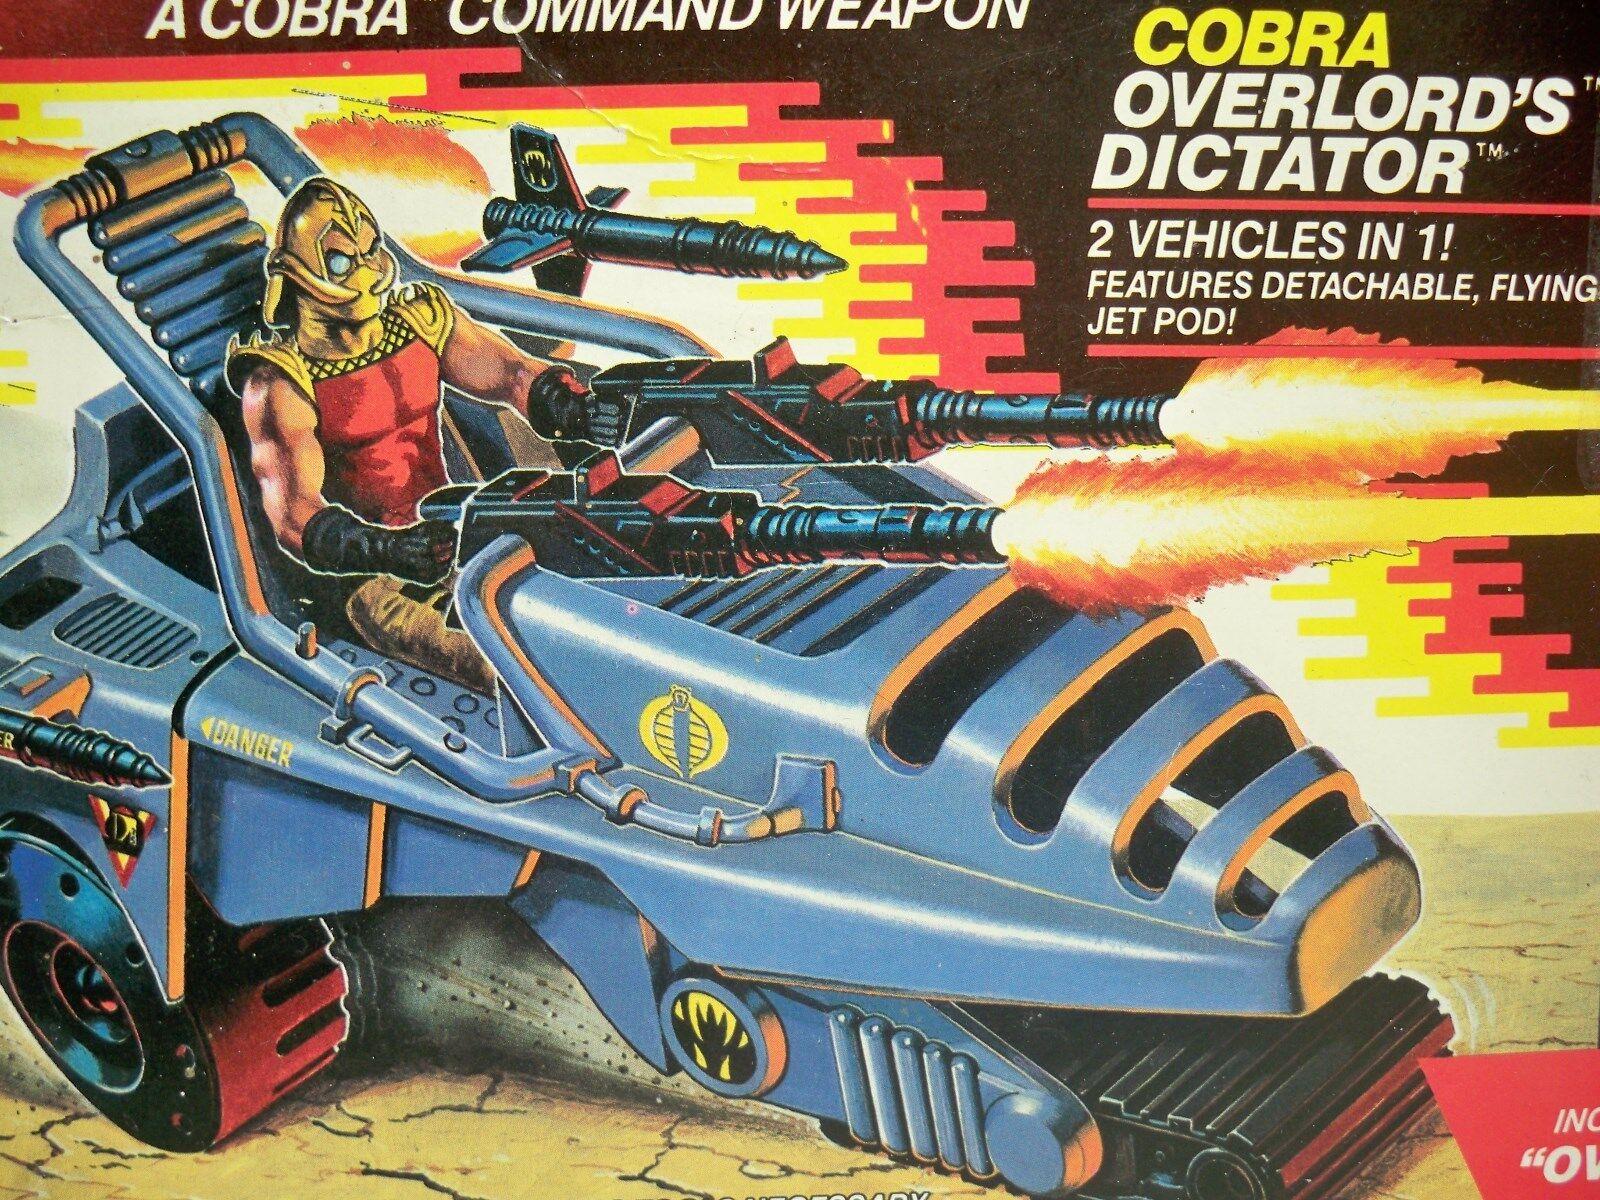 D1008904 OVERLORD'S DICTATOR 1989 GI JOE COBRA MISB MIB FACTORY SEALED NEW